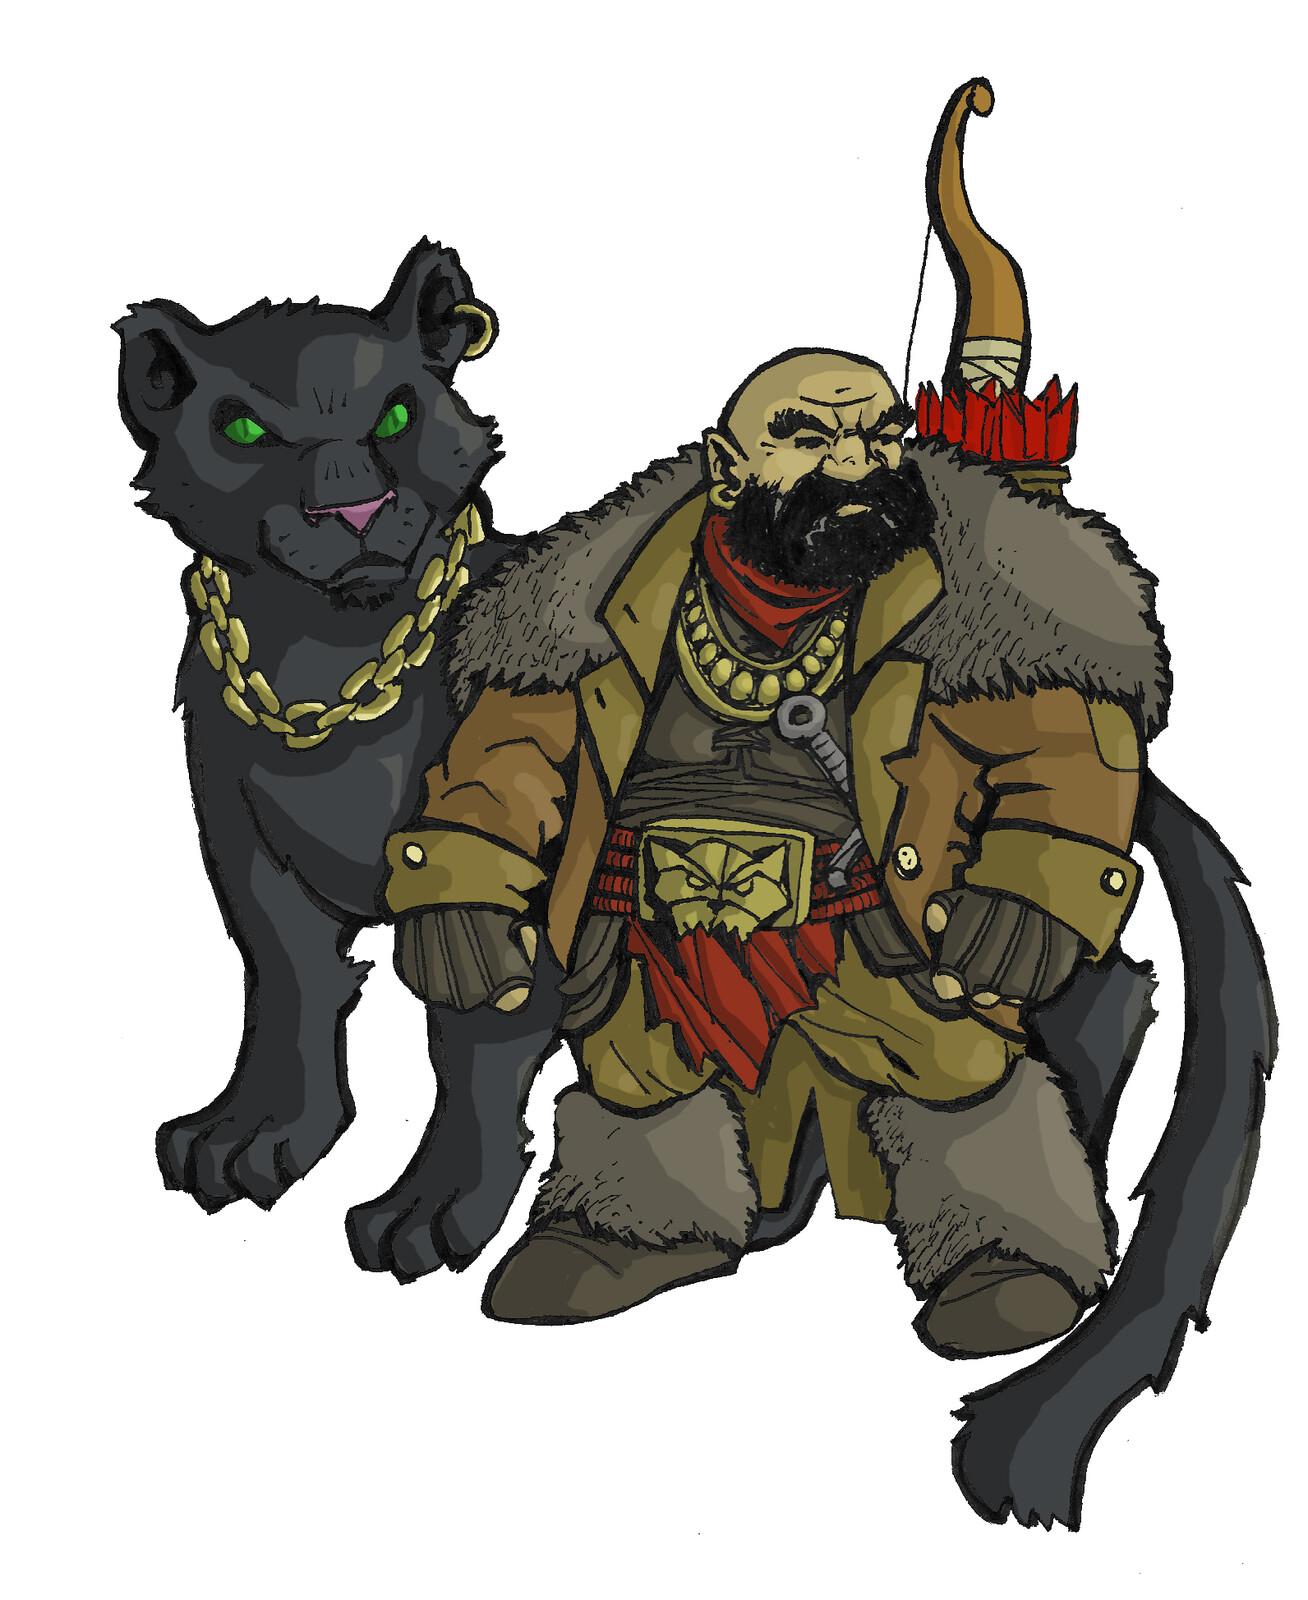 Dwarf BeastMaster